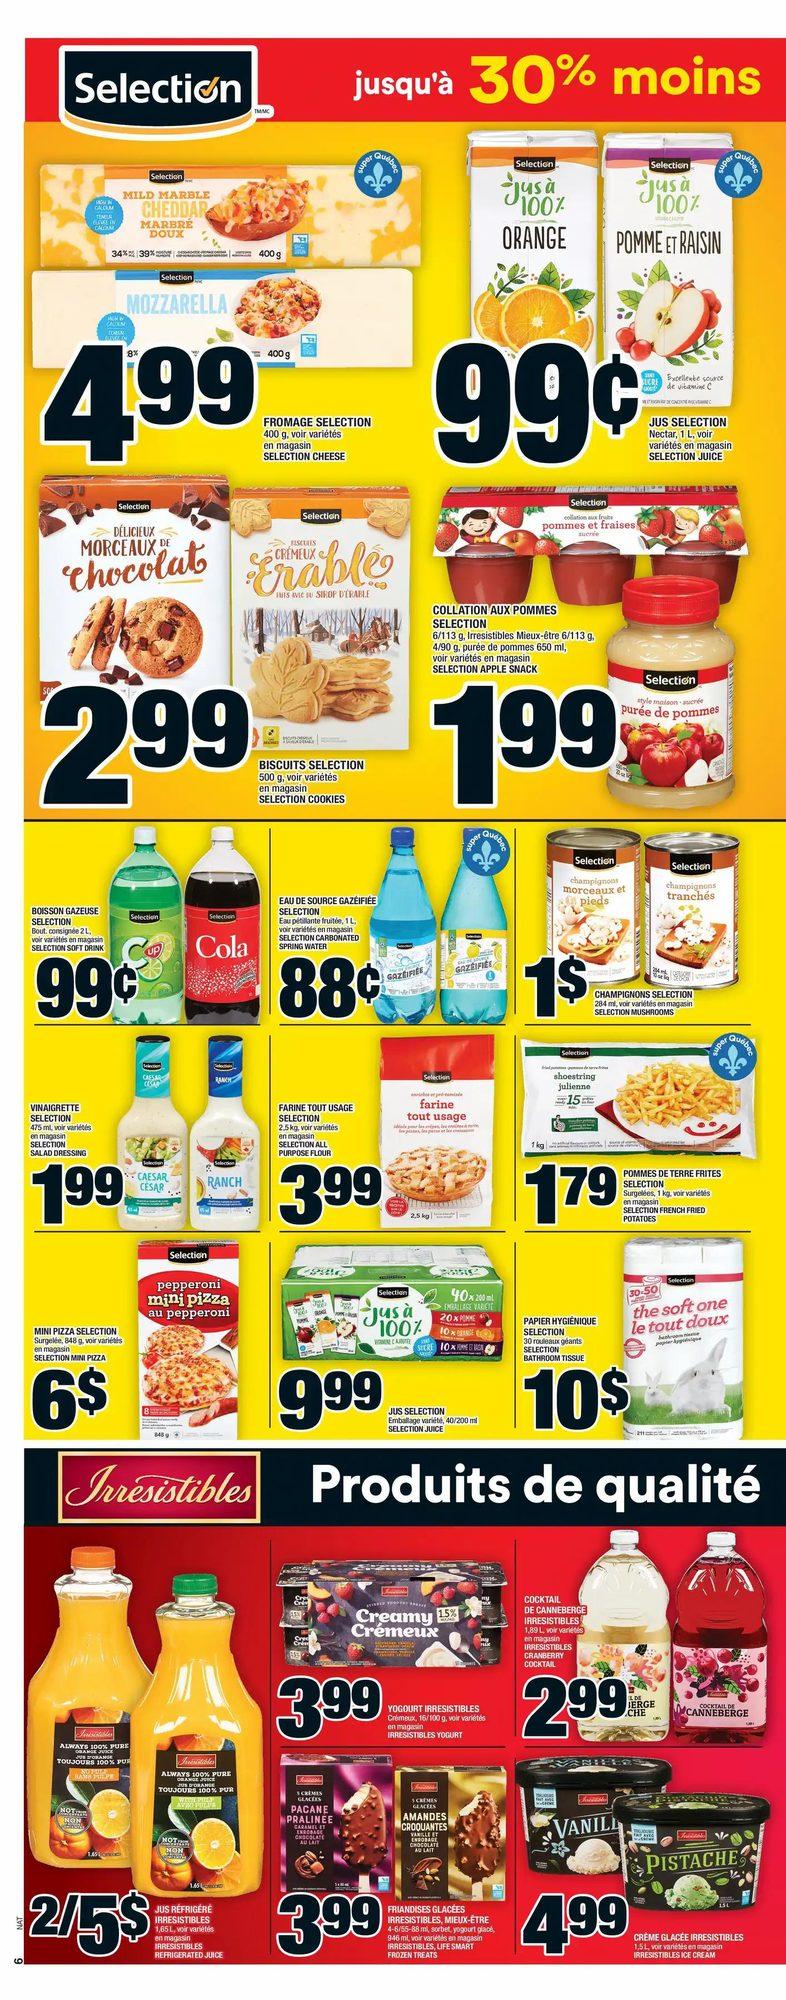 Super C - Weekly Flyer Specials - Page 11